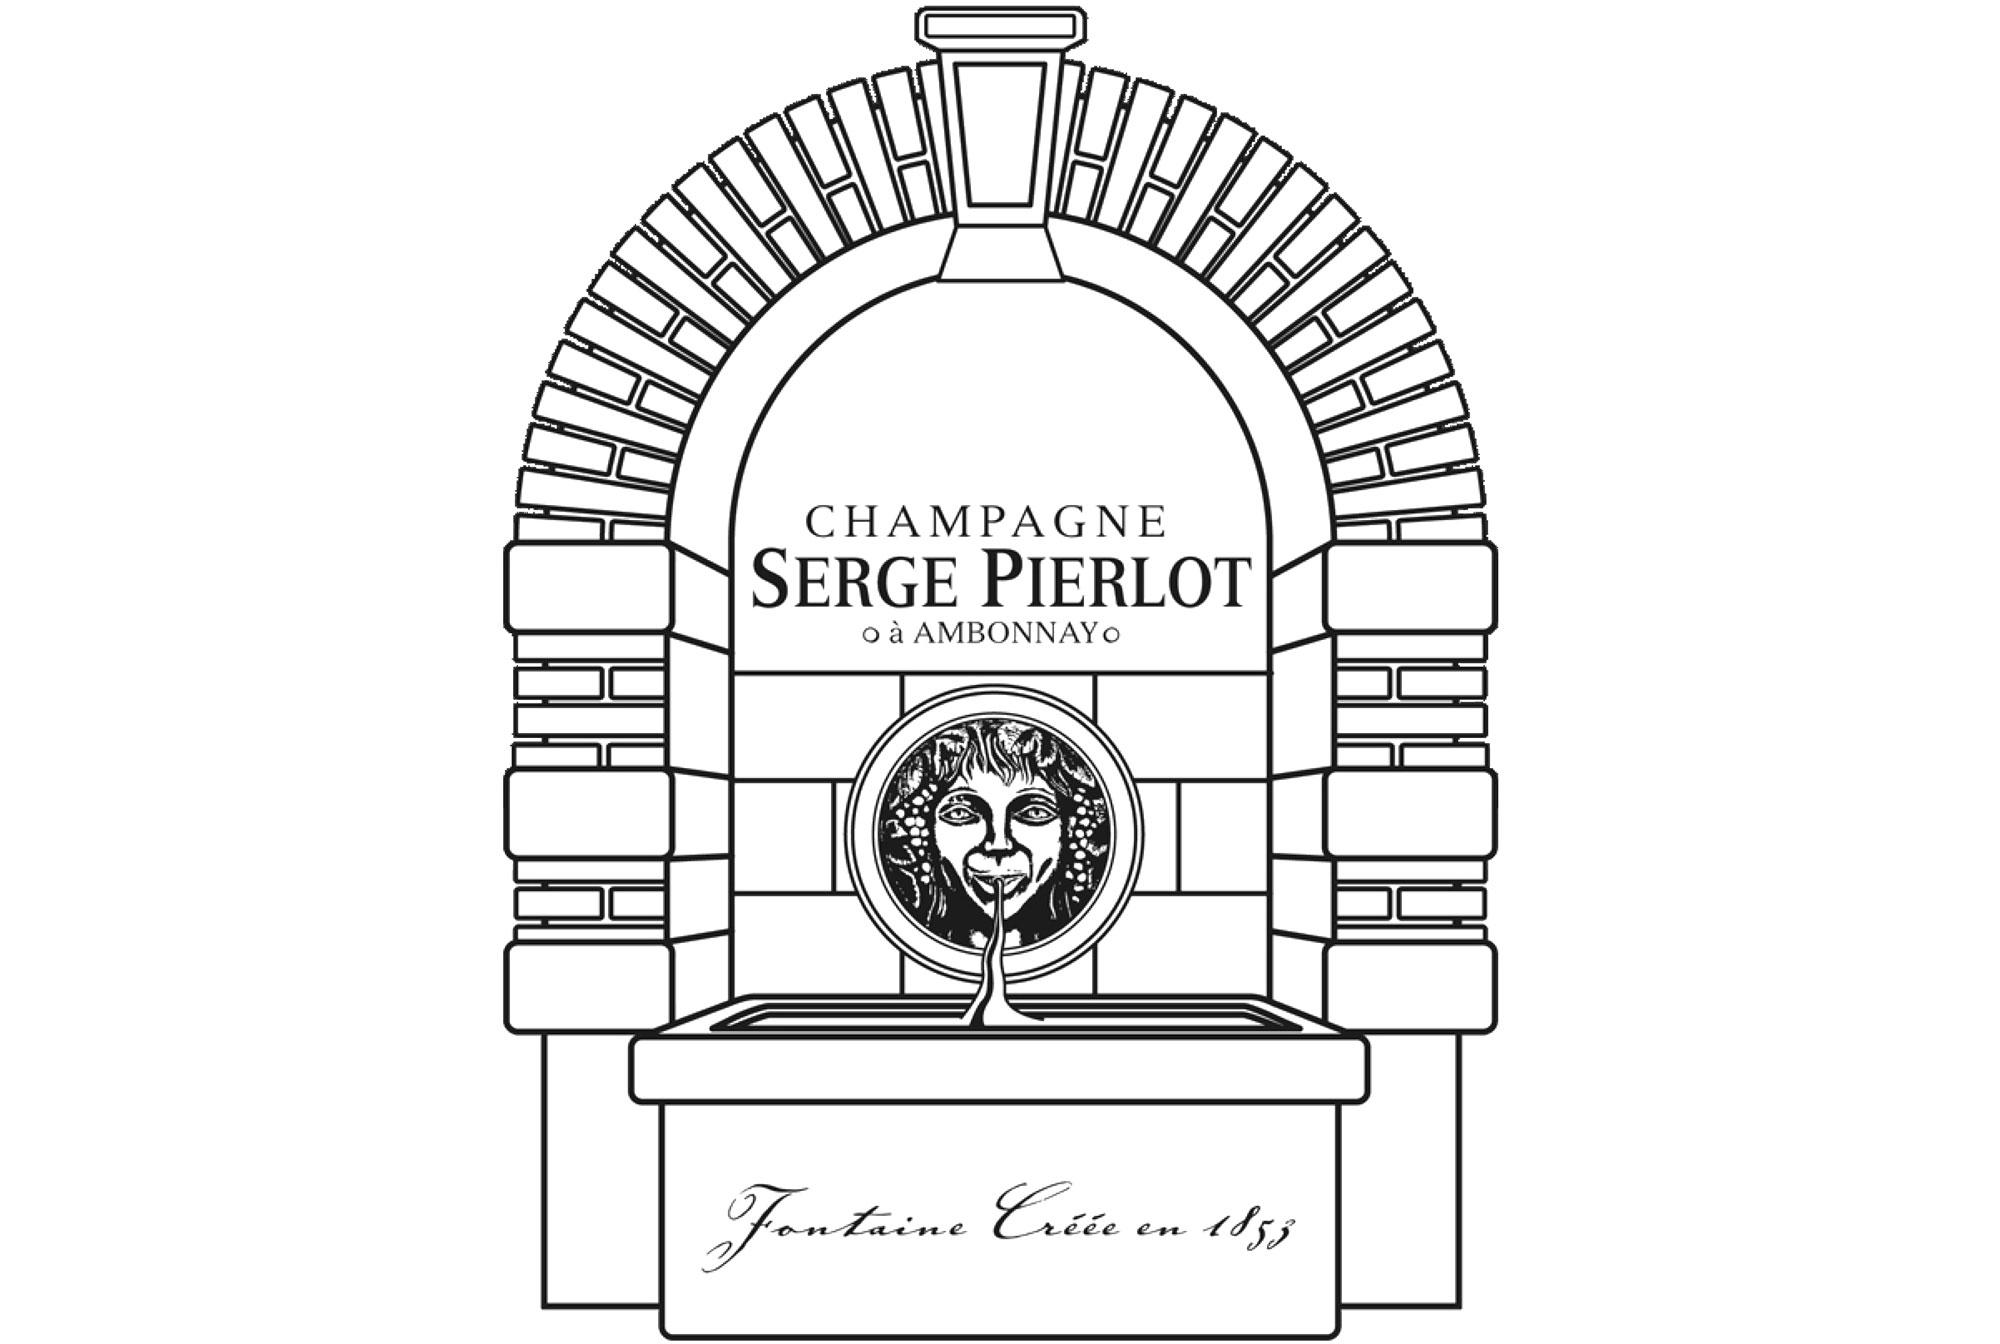 Champagne Serge Pierlot